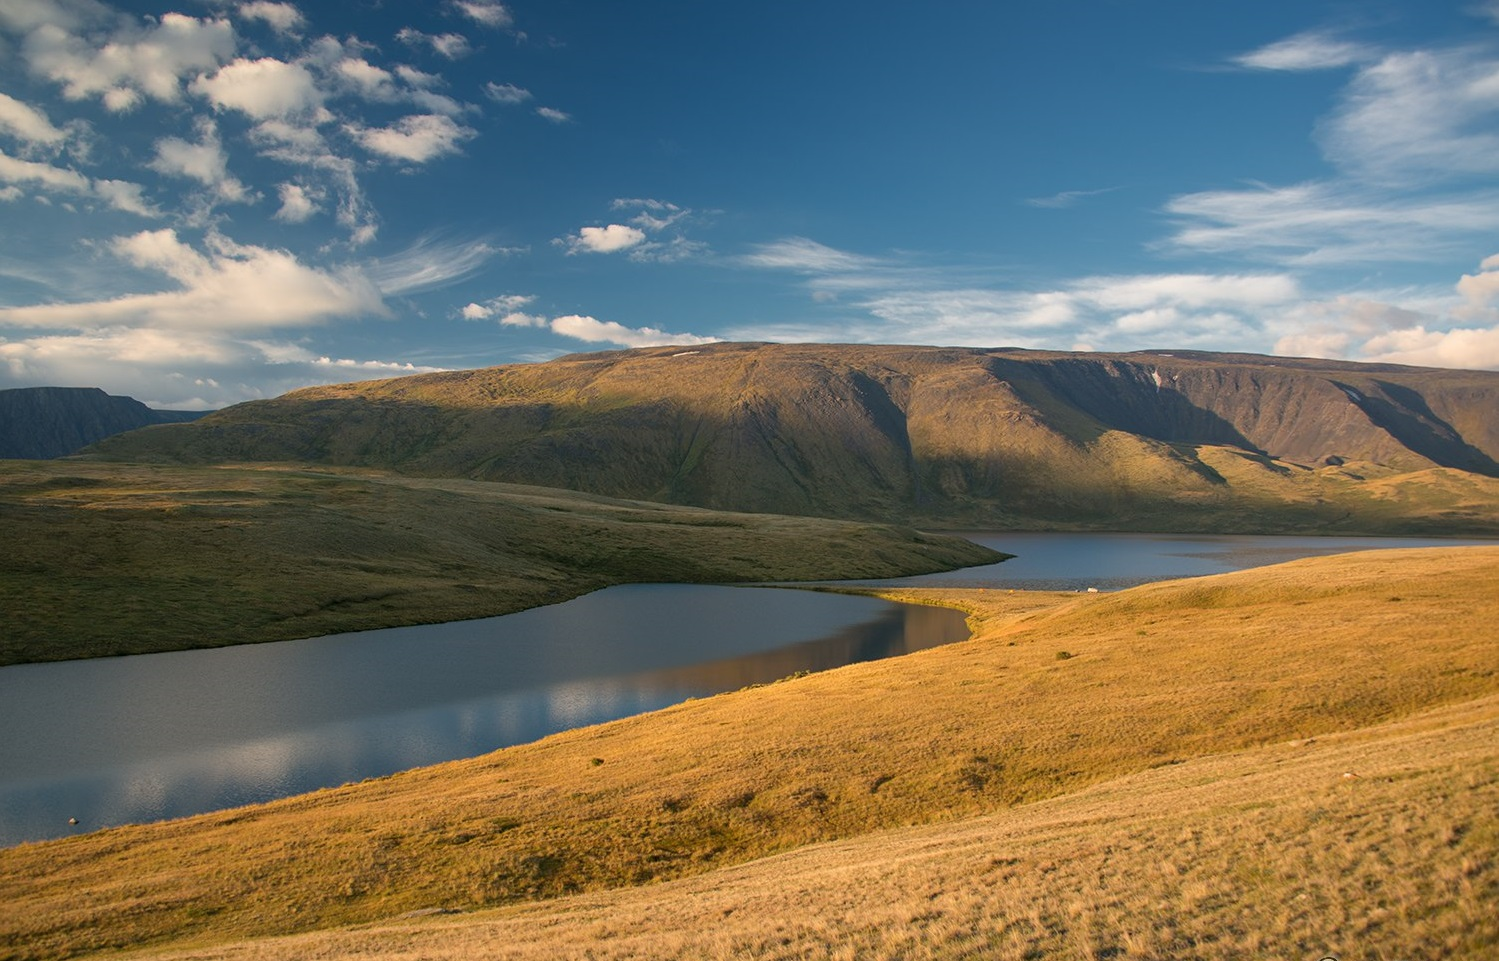 26 1 - 10 locais no Altay que vale a pena visitar